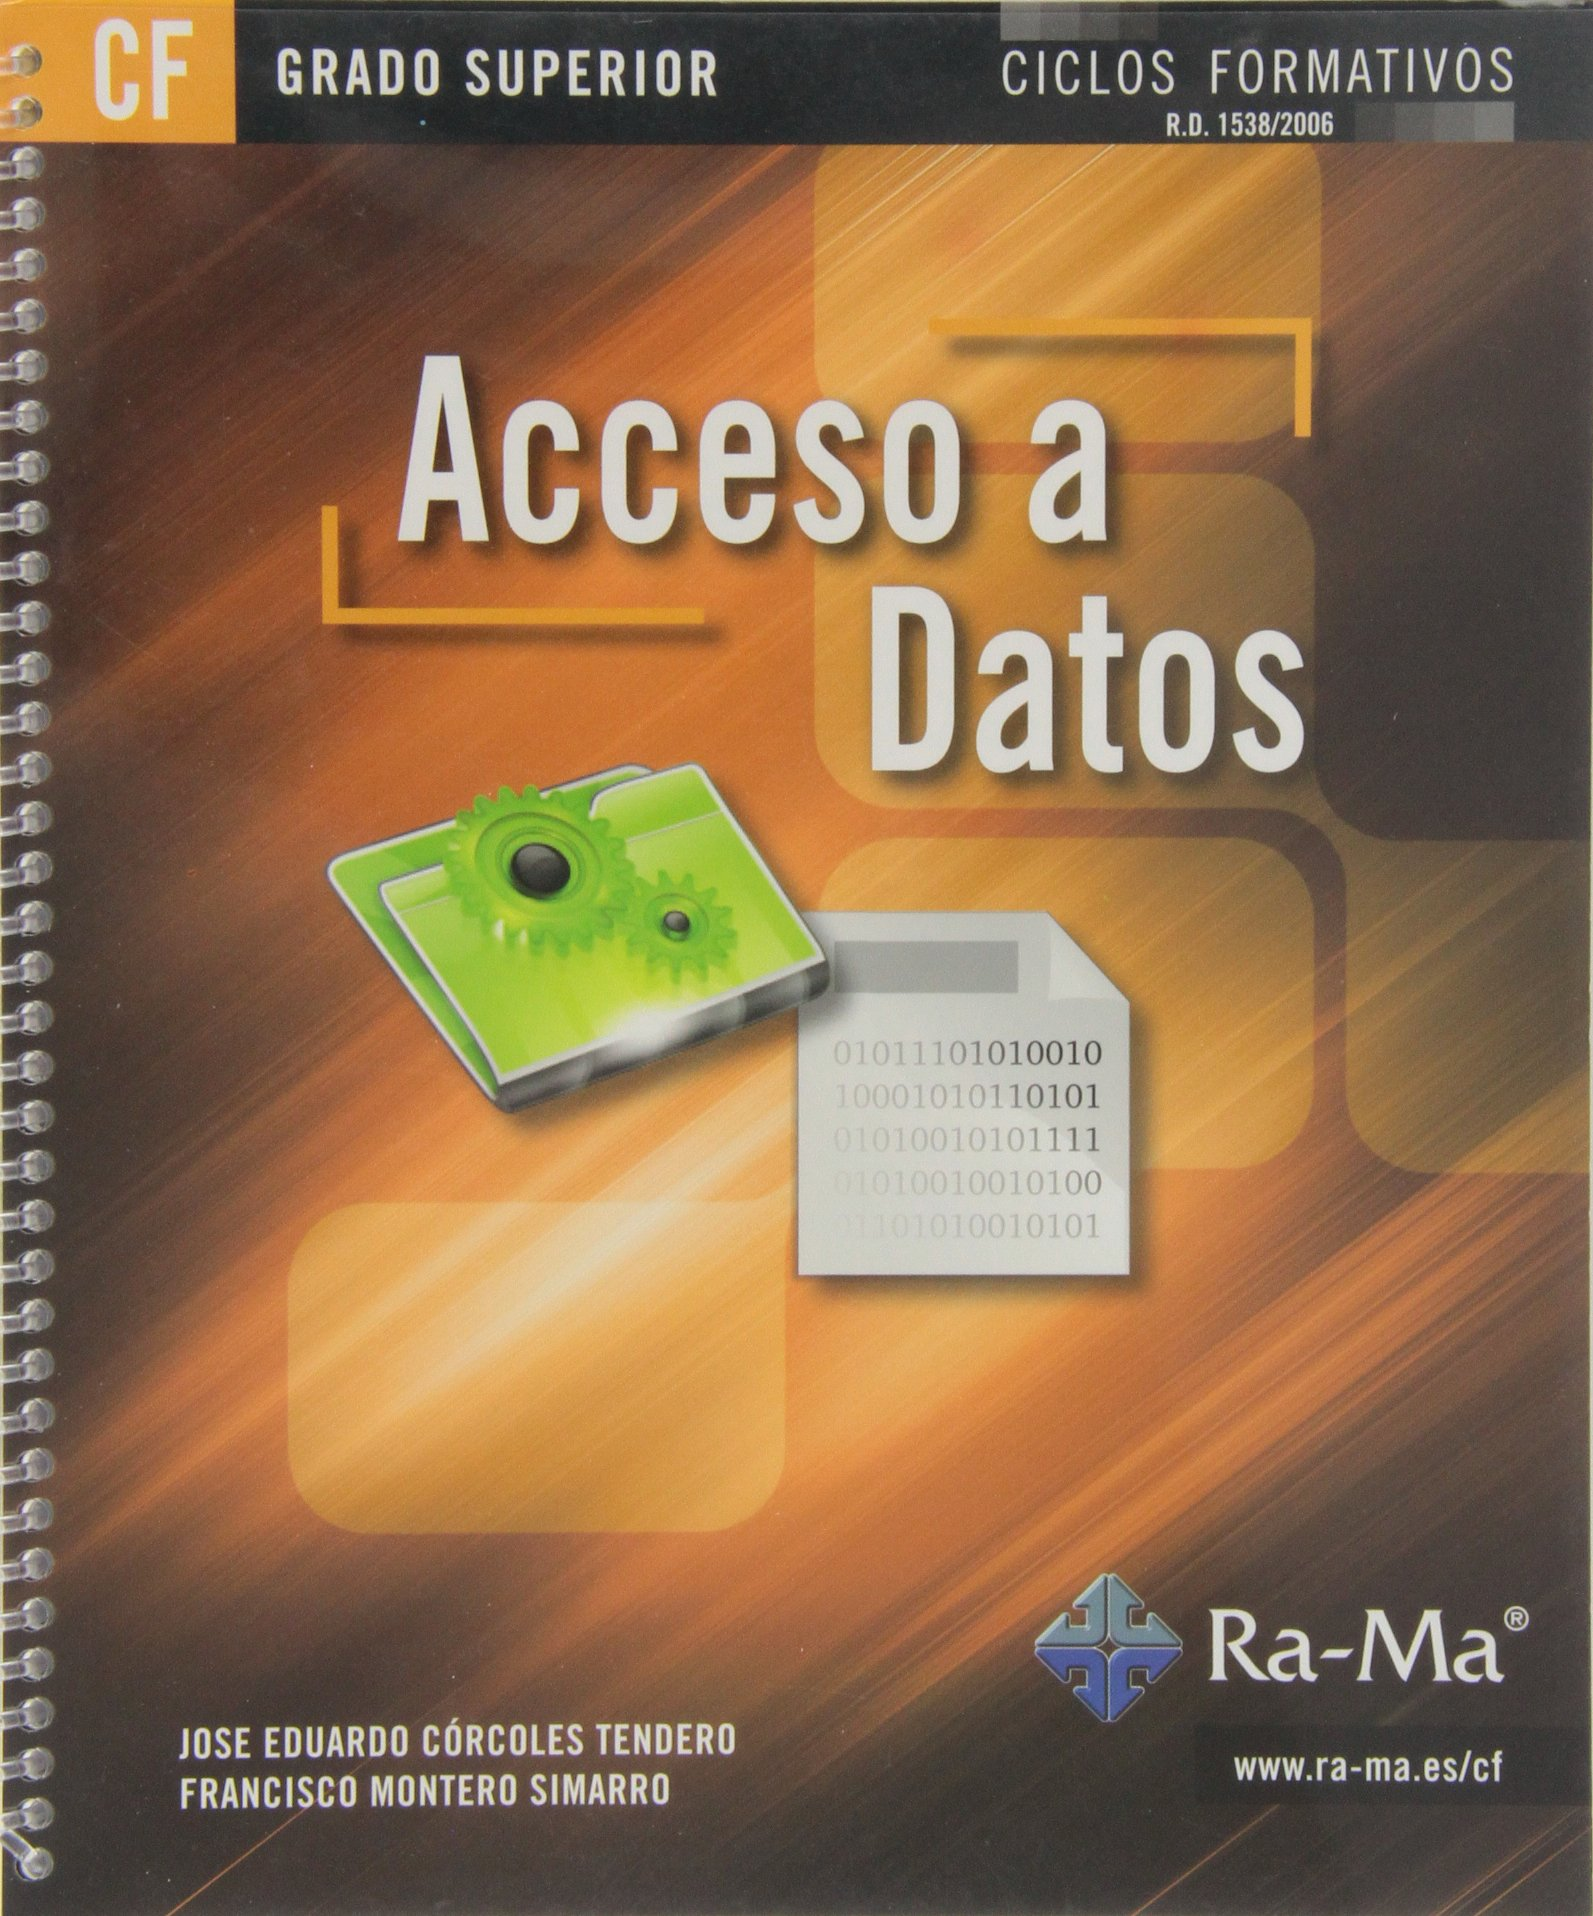 Acceso a Datos (GRADO SUPERIOR) Tapa blanda – 10 jun 2013 Francisco Montero Simarro ANTONIO GARCIA TOME 849964239X Databases